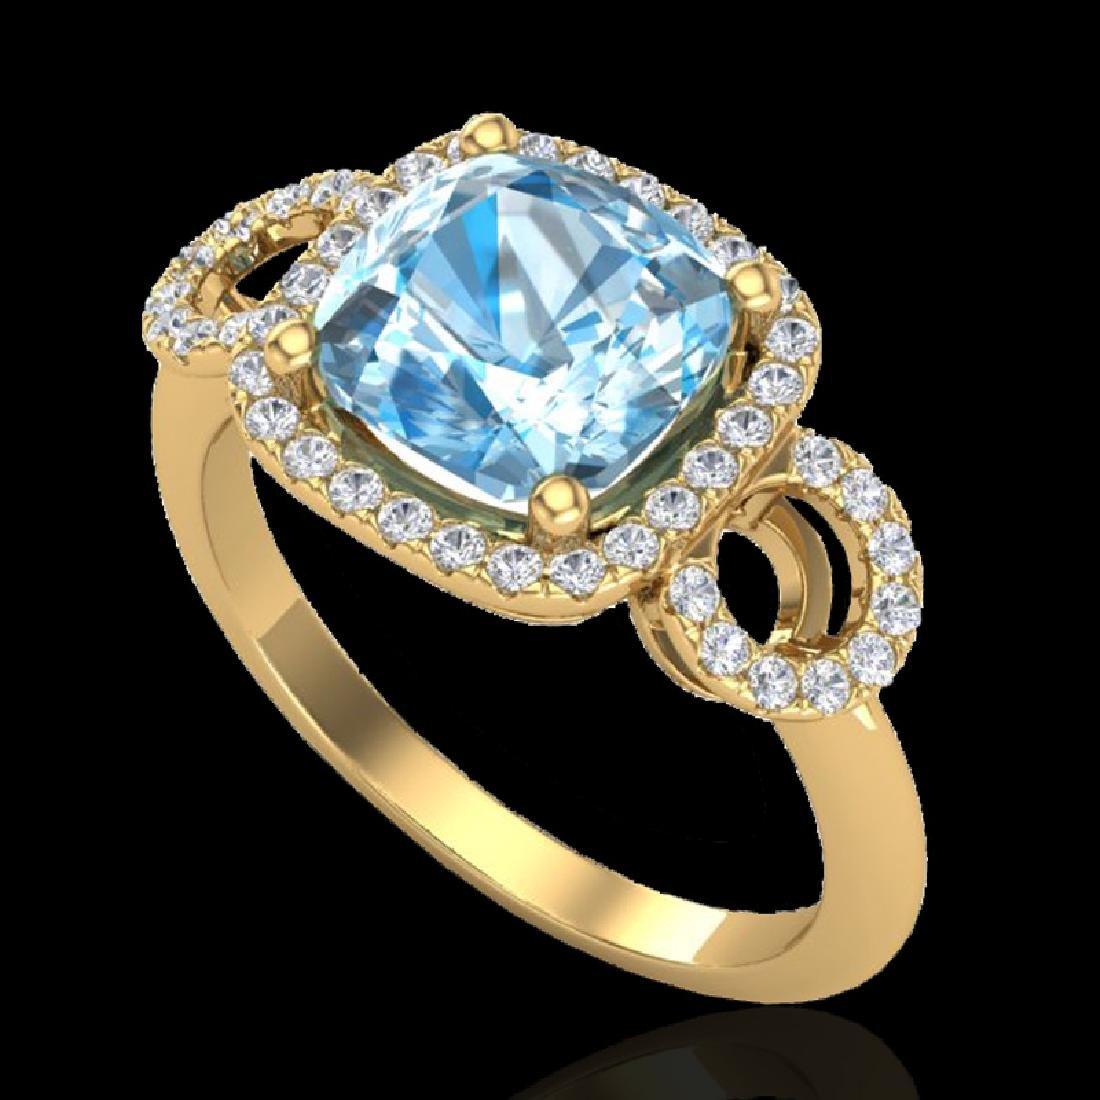 3.75 CTW Topaz & Micro VS/SI Diamond Ring 18K Yellow - 2